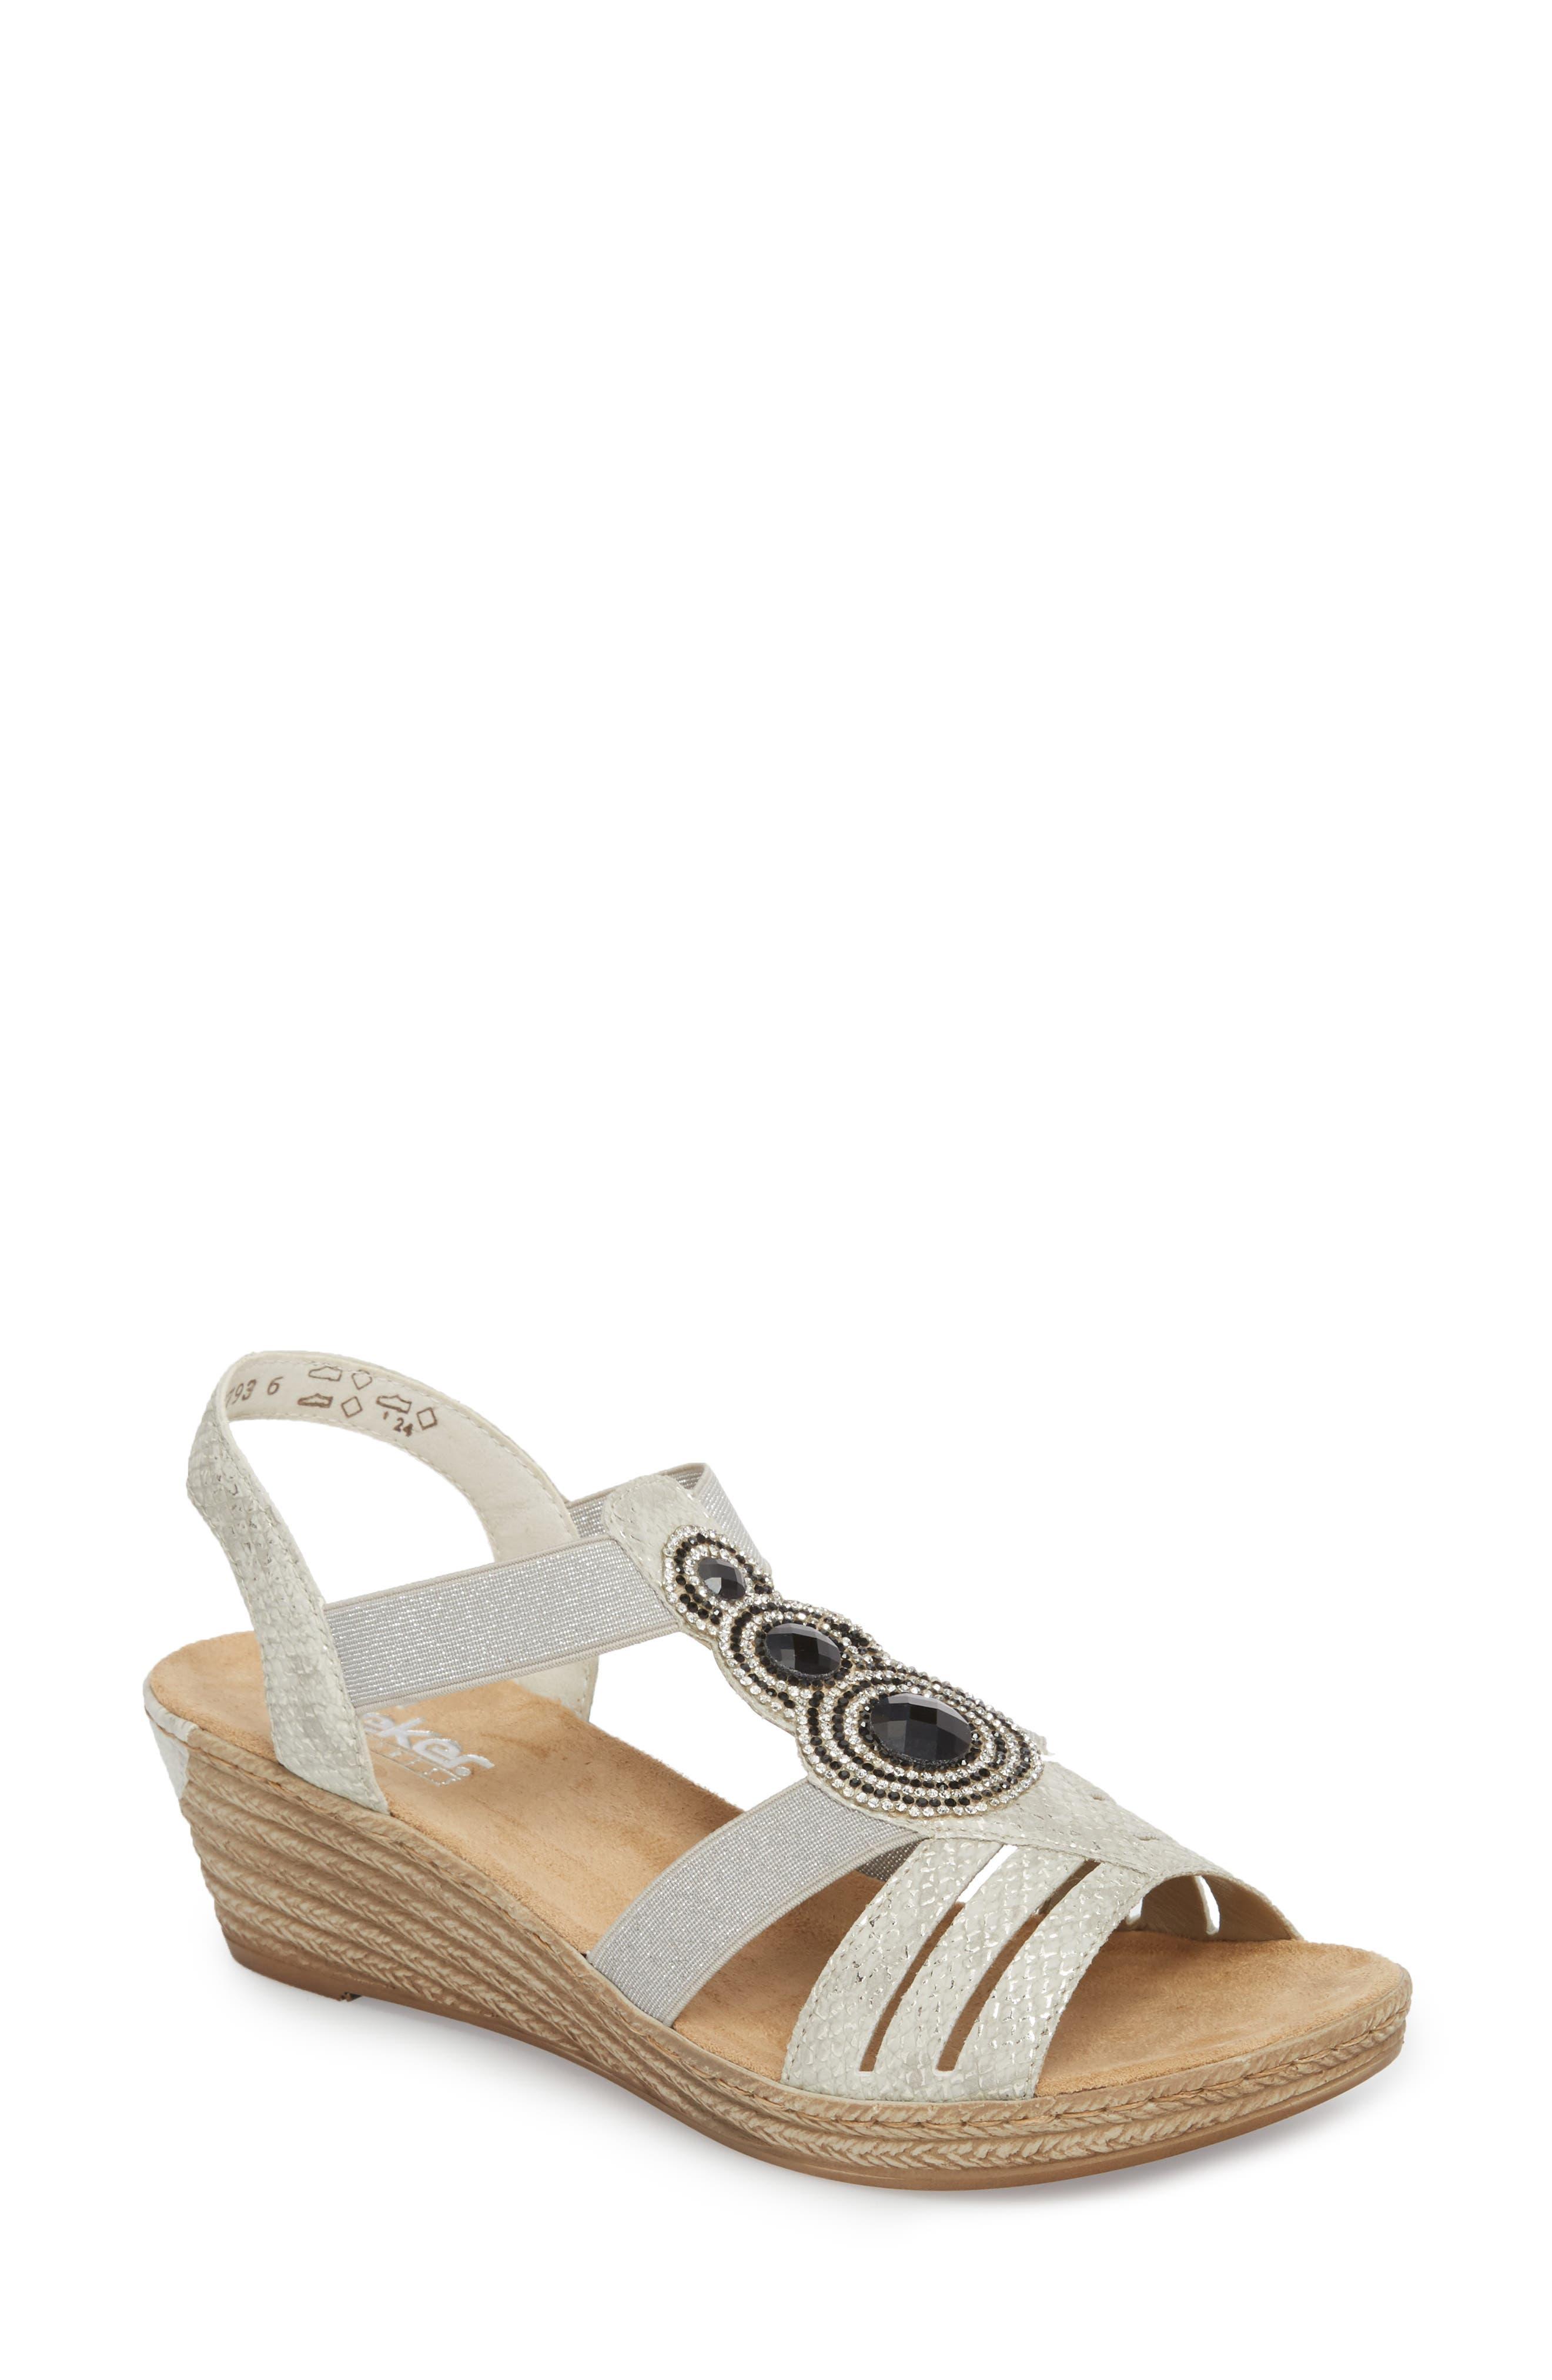 'Fanni' Wedge Sandal,                         Main,                         color, ICE